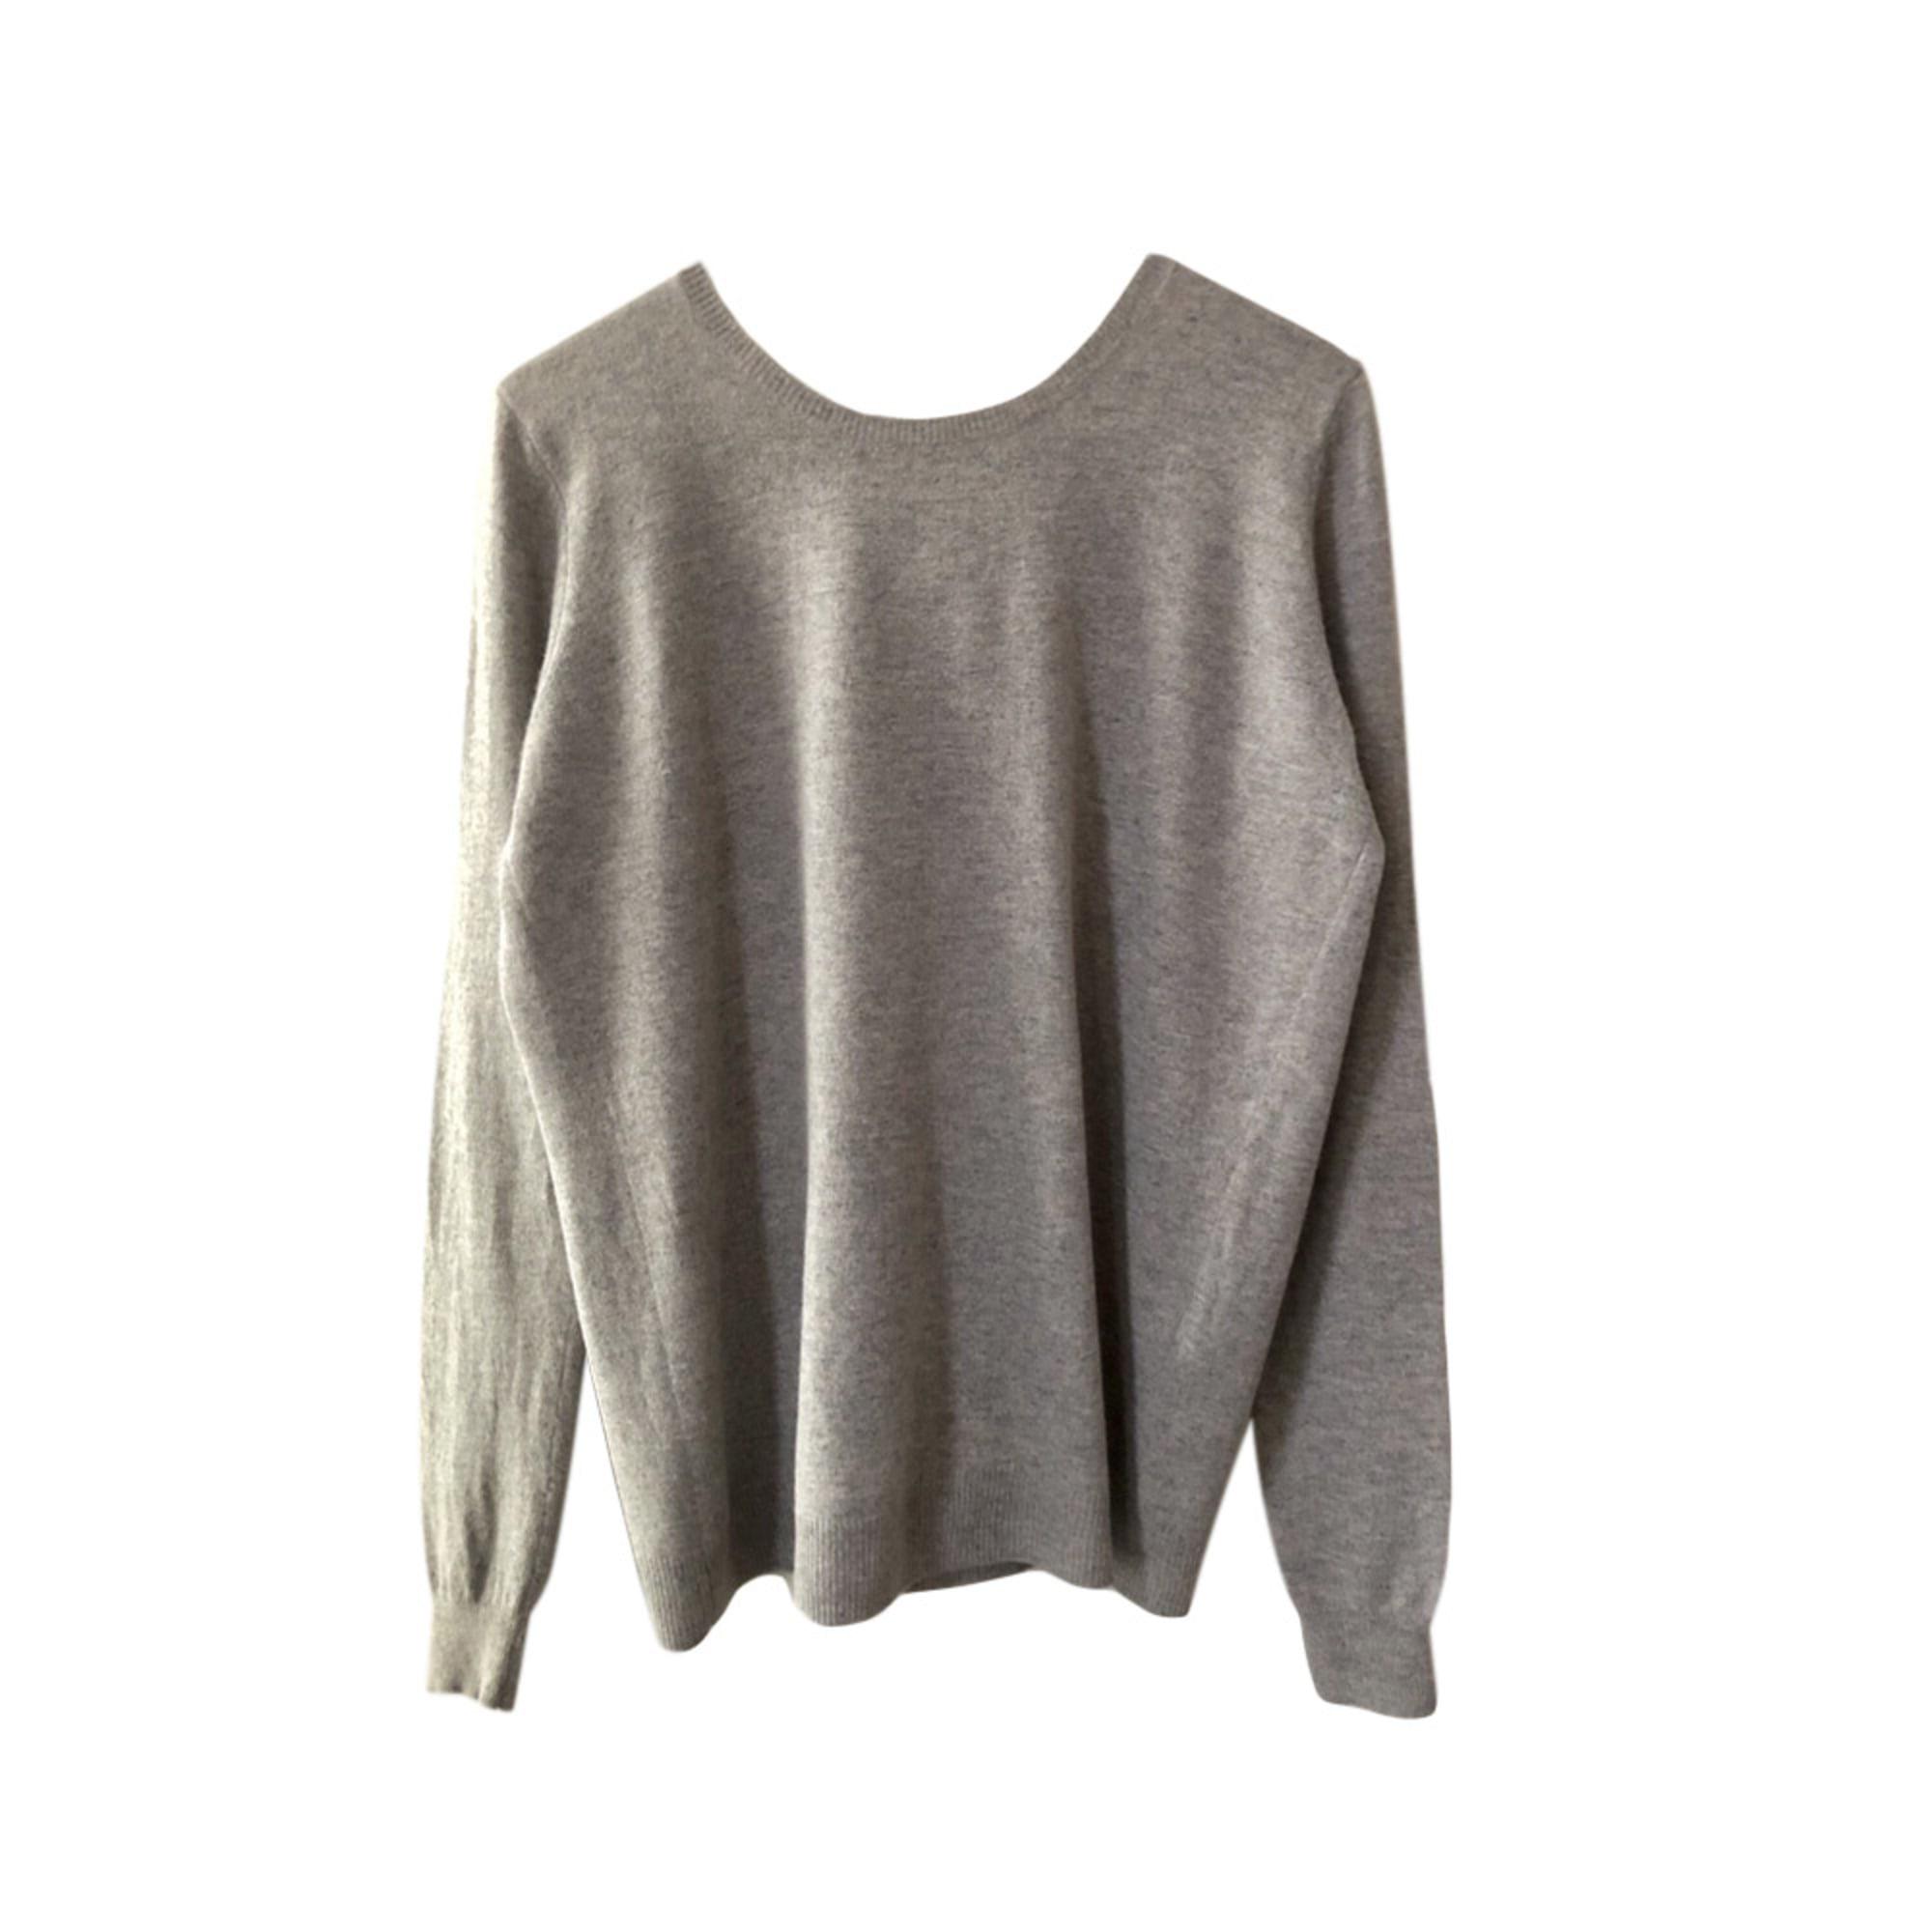 Sweater CLAUDIE PIERLOT Gray, charcoal